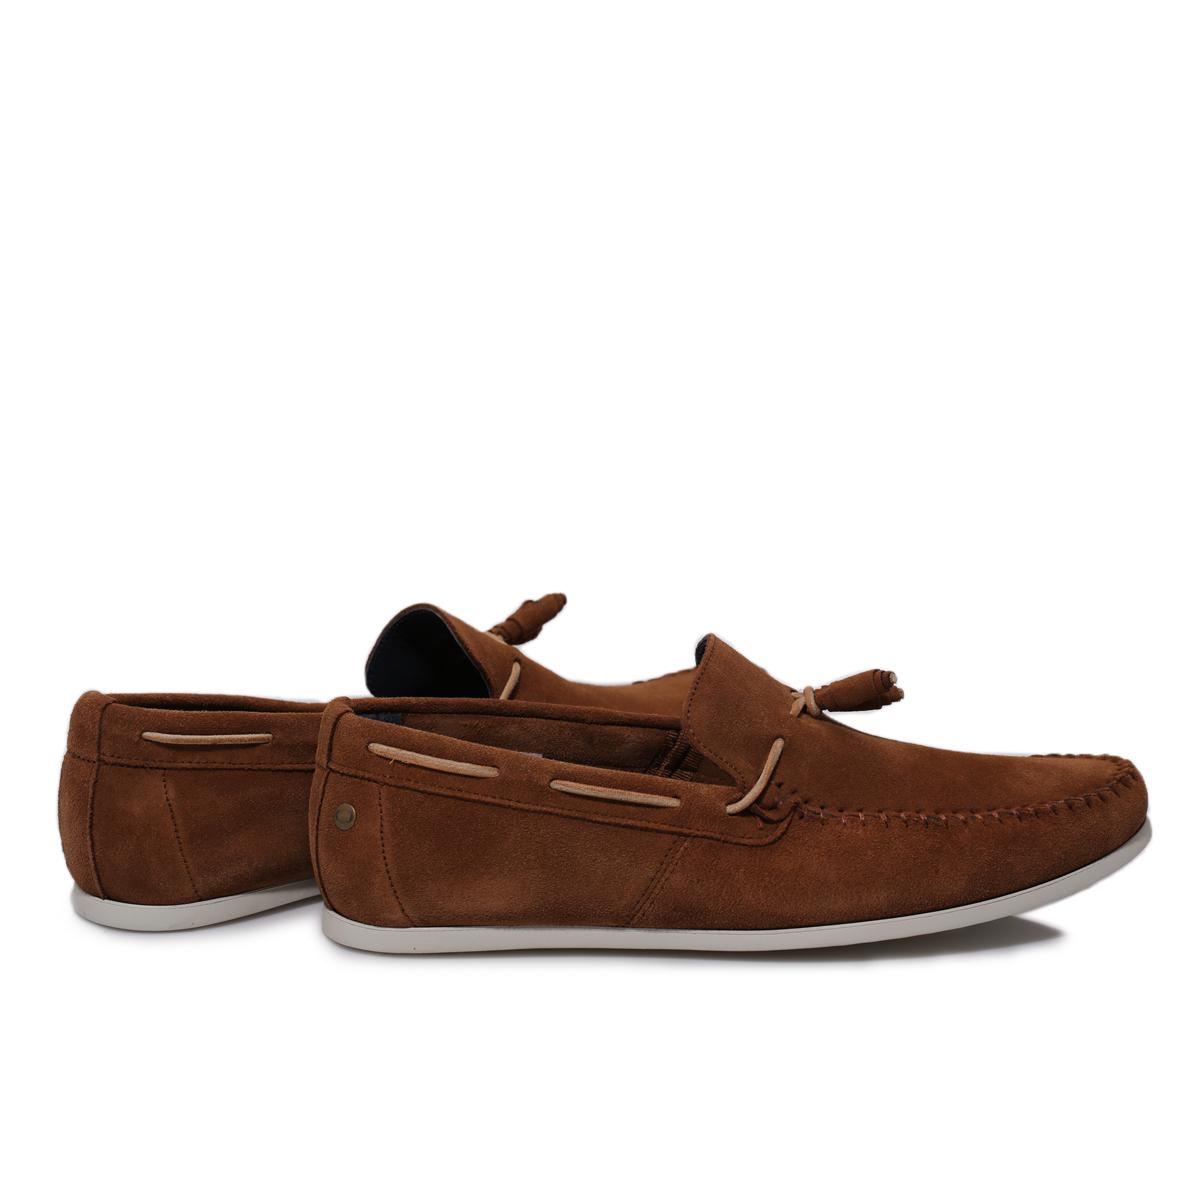 Base London Mens Joplin Brown Suede Moccasins Deck Boat Shoes Size ...